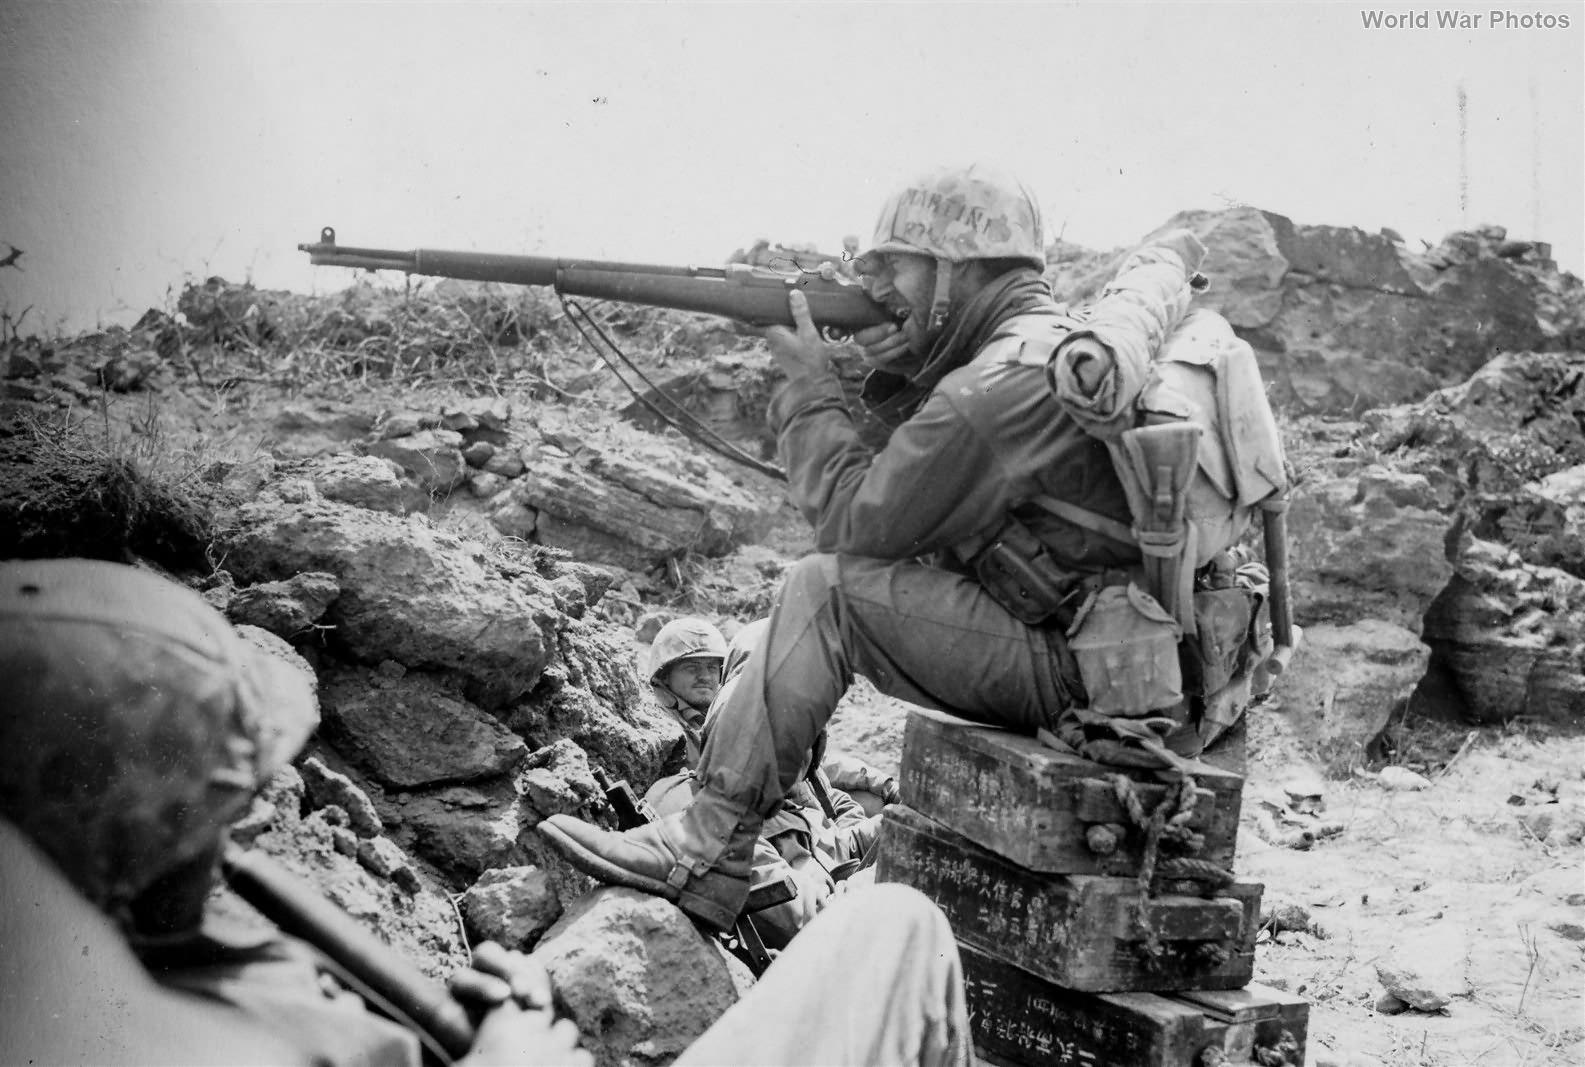 Marine NCO Sharpshooter in Action on Iwo Jima 12mar